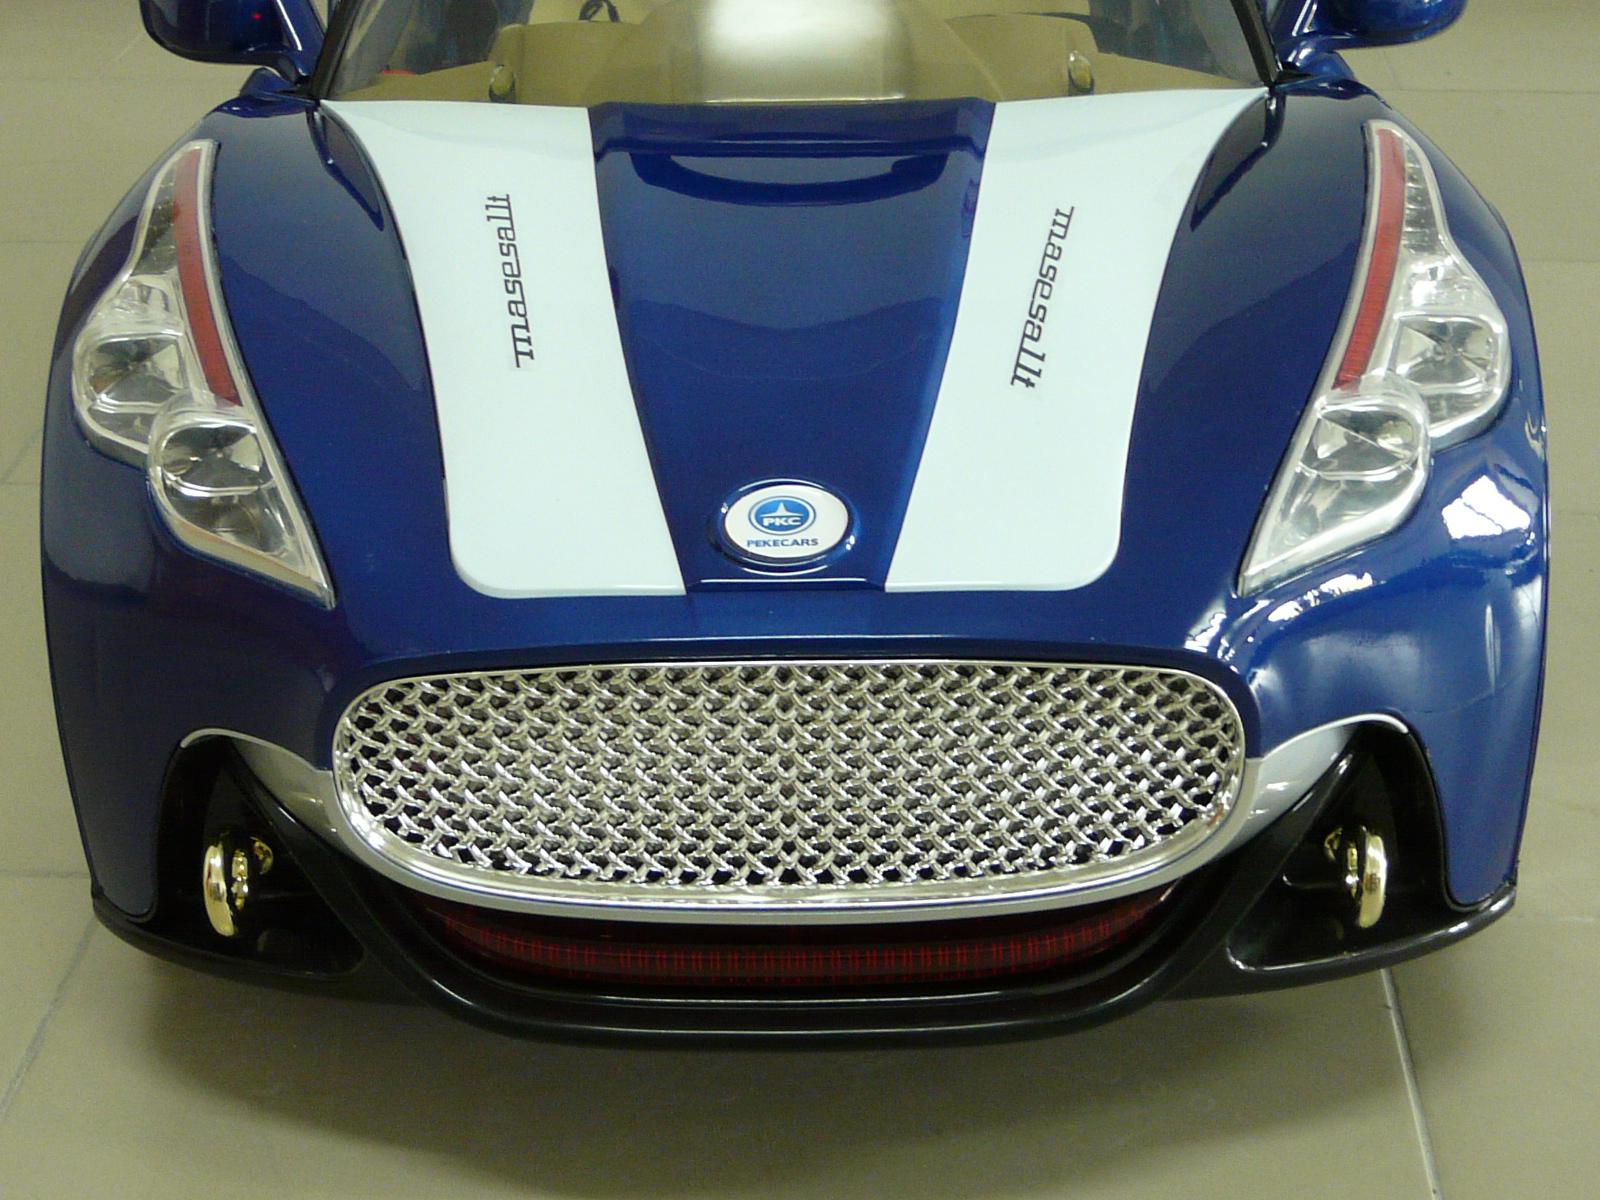 GT deportivo azul frontal width=